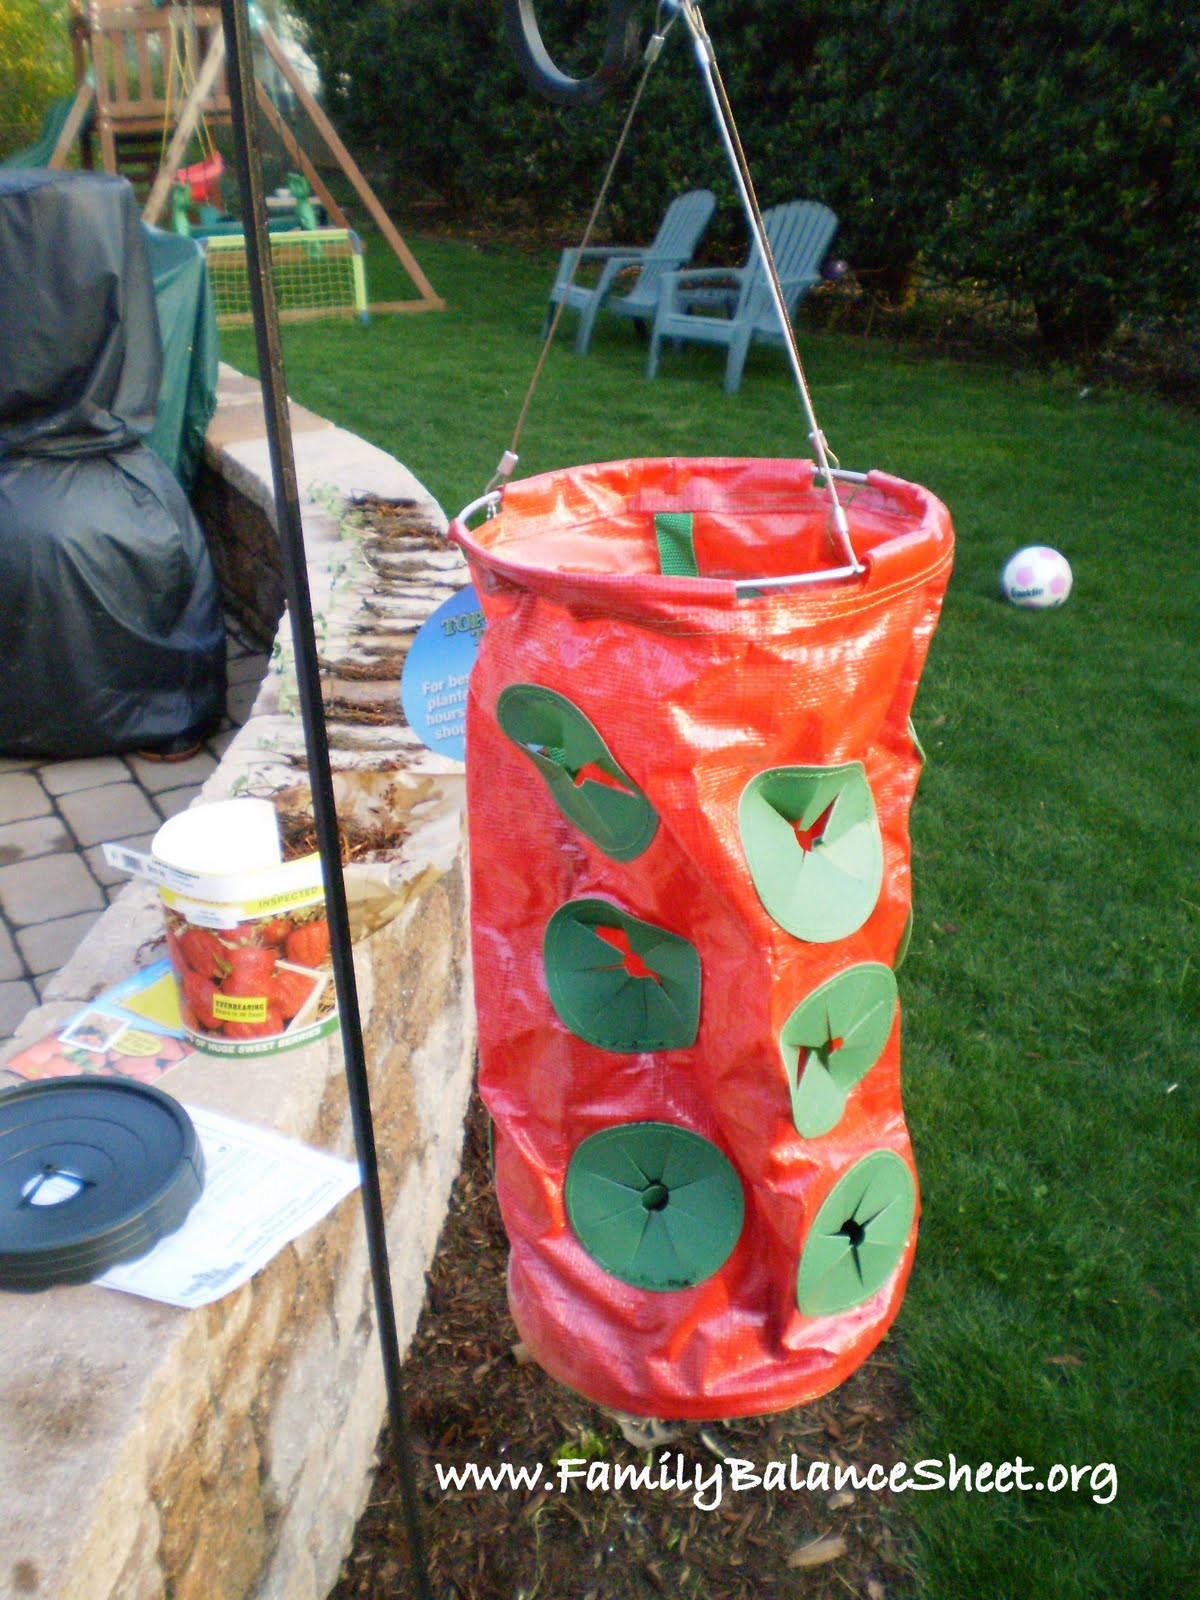 Topsy Turvy Strawberries An Experiment Family Balance Sheet